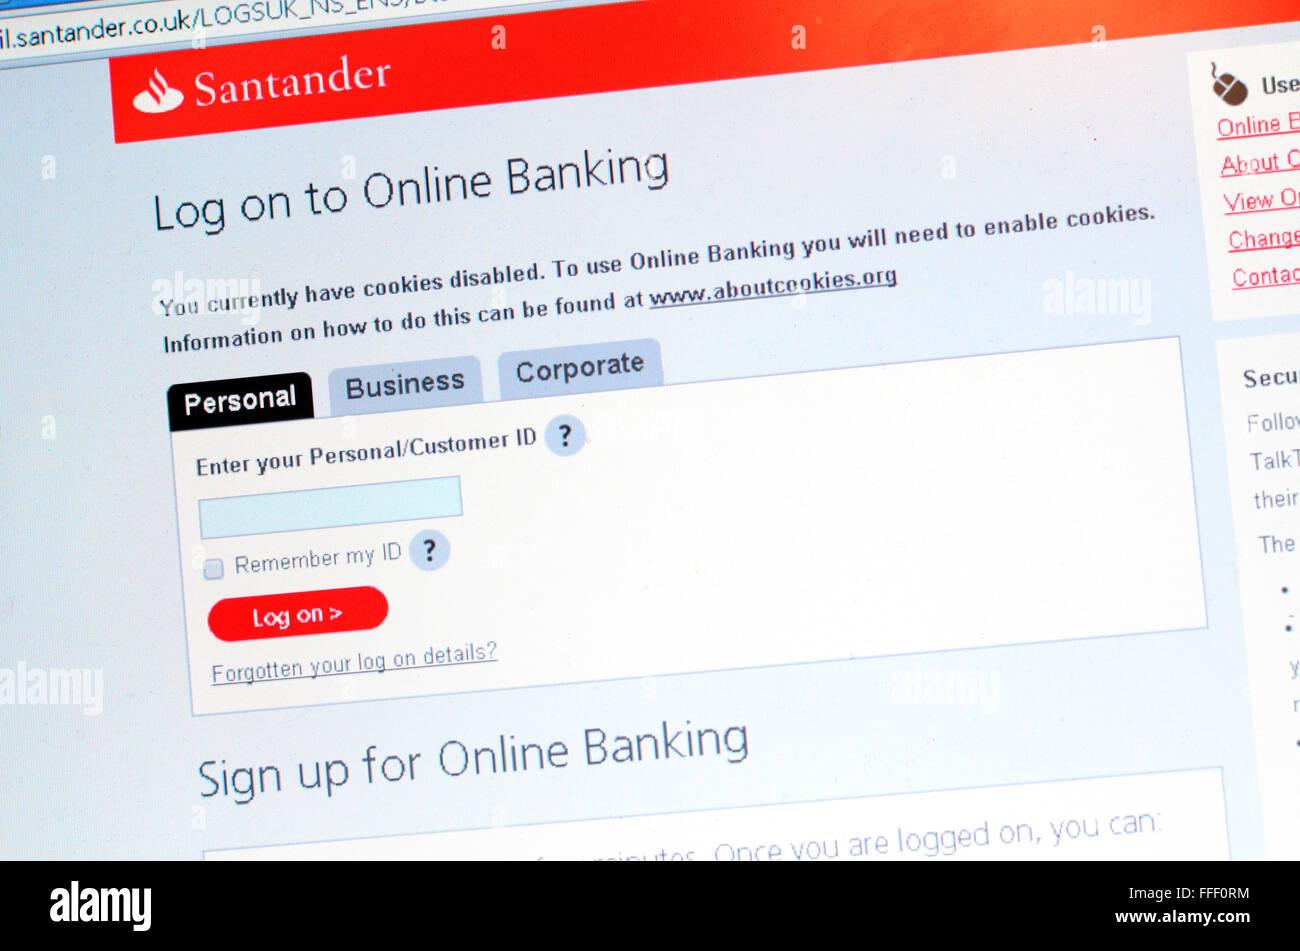 Santander Online Banking Log On Instructions Gallery